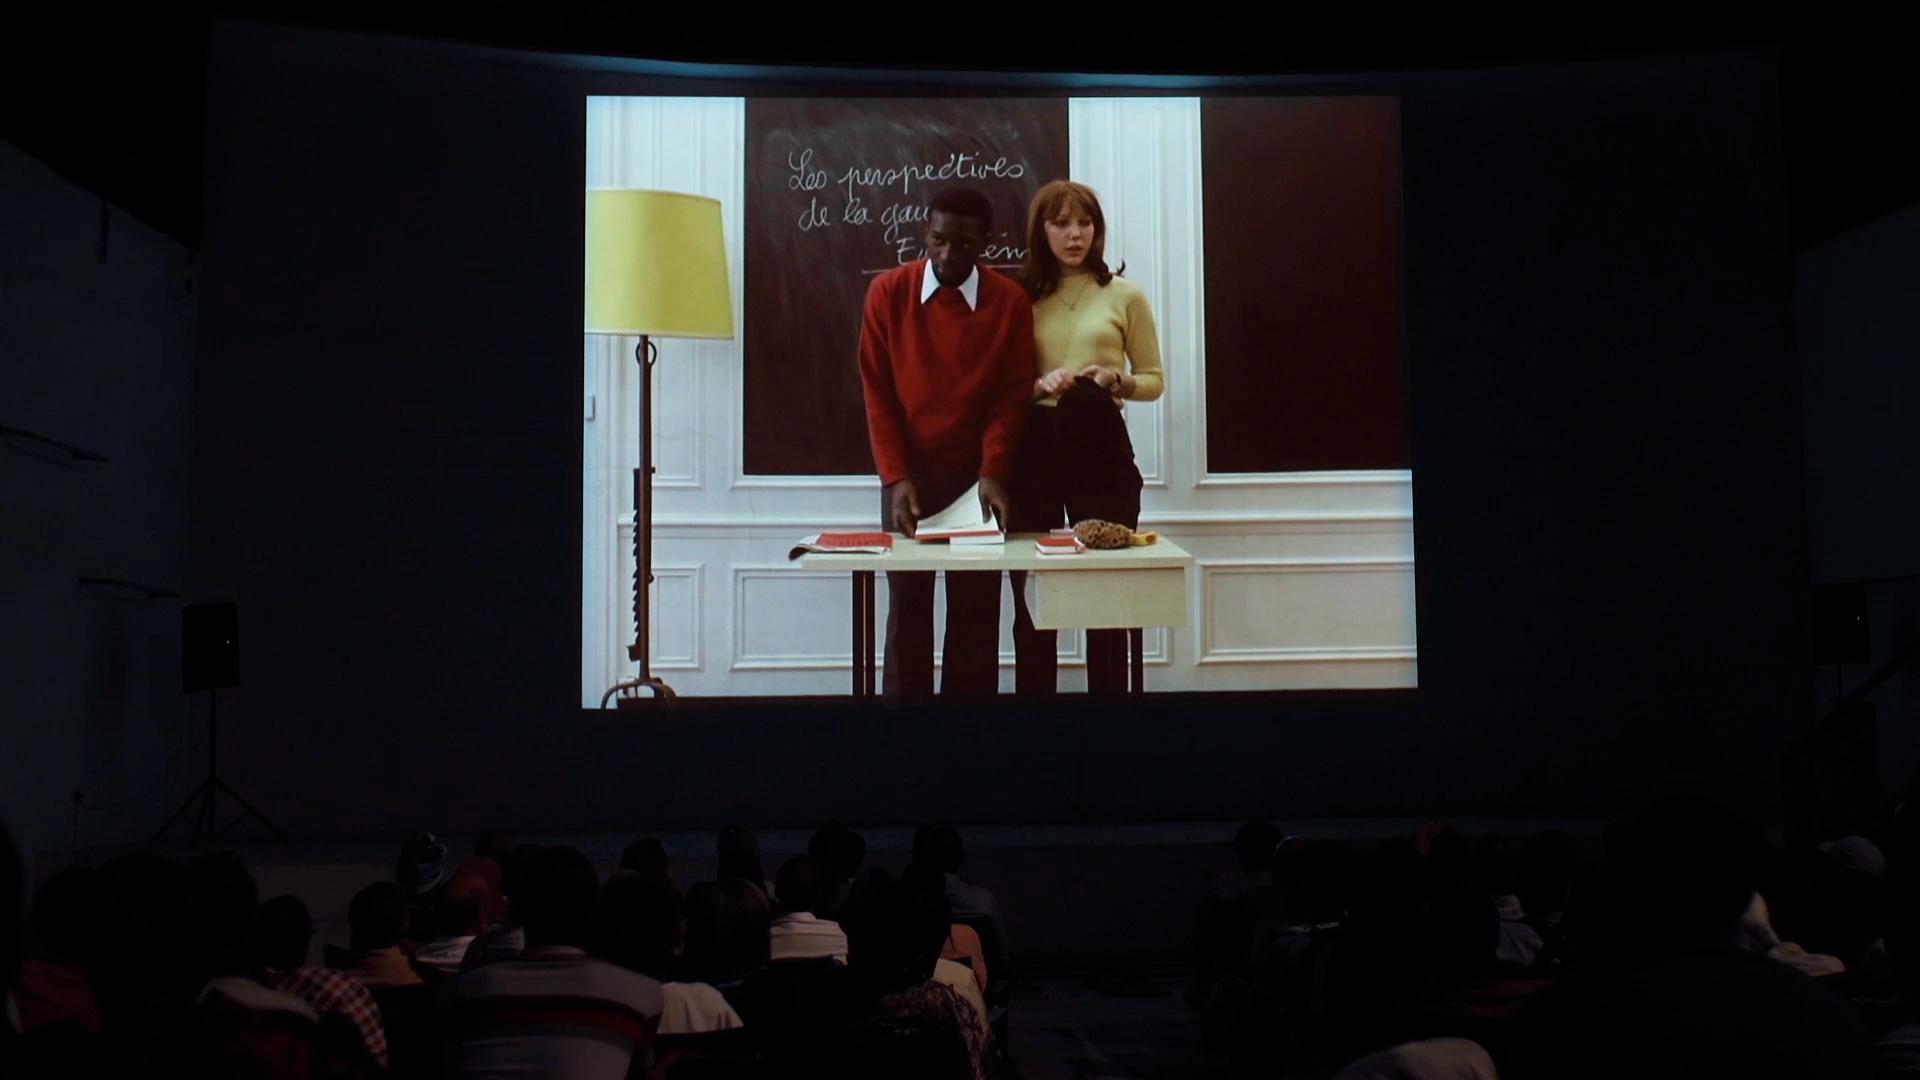 Vincent Messen, <i>Juste un mouvement</i>, 2021. Video still, 108''. Courtesy of the artist